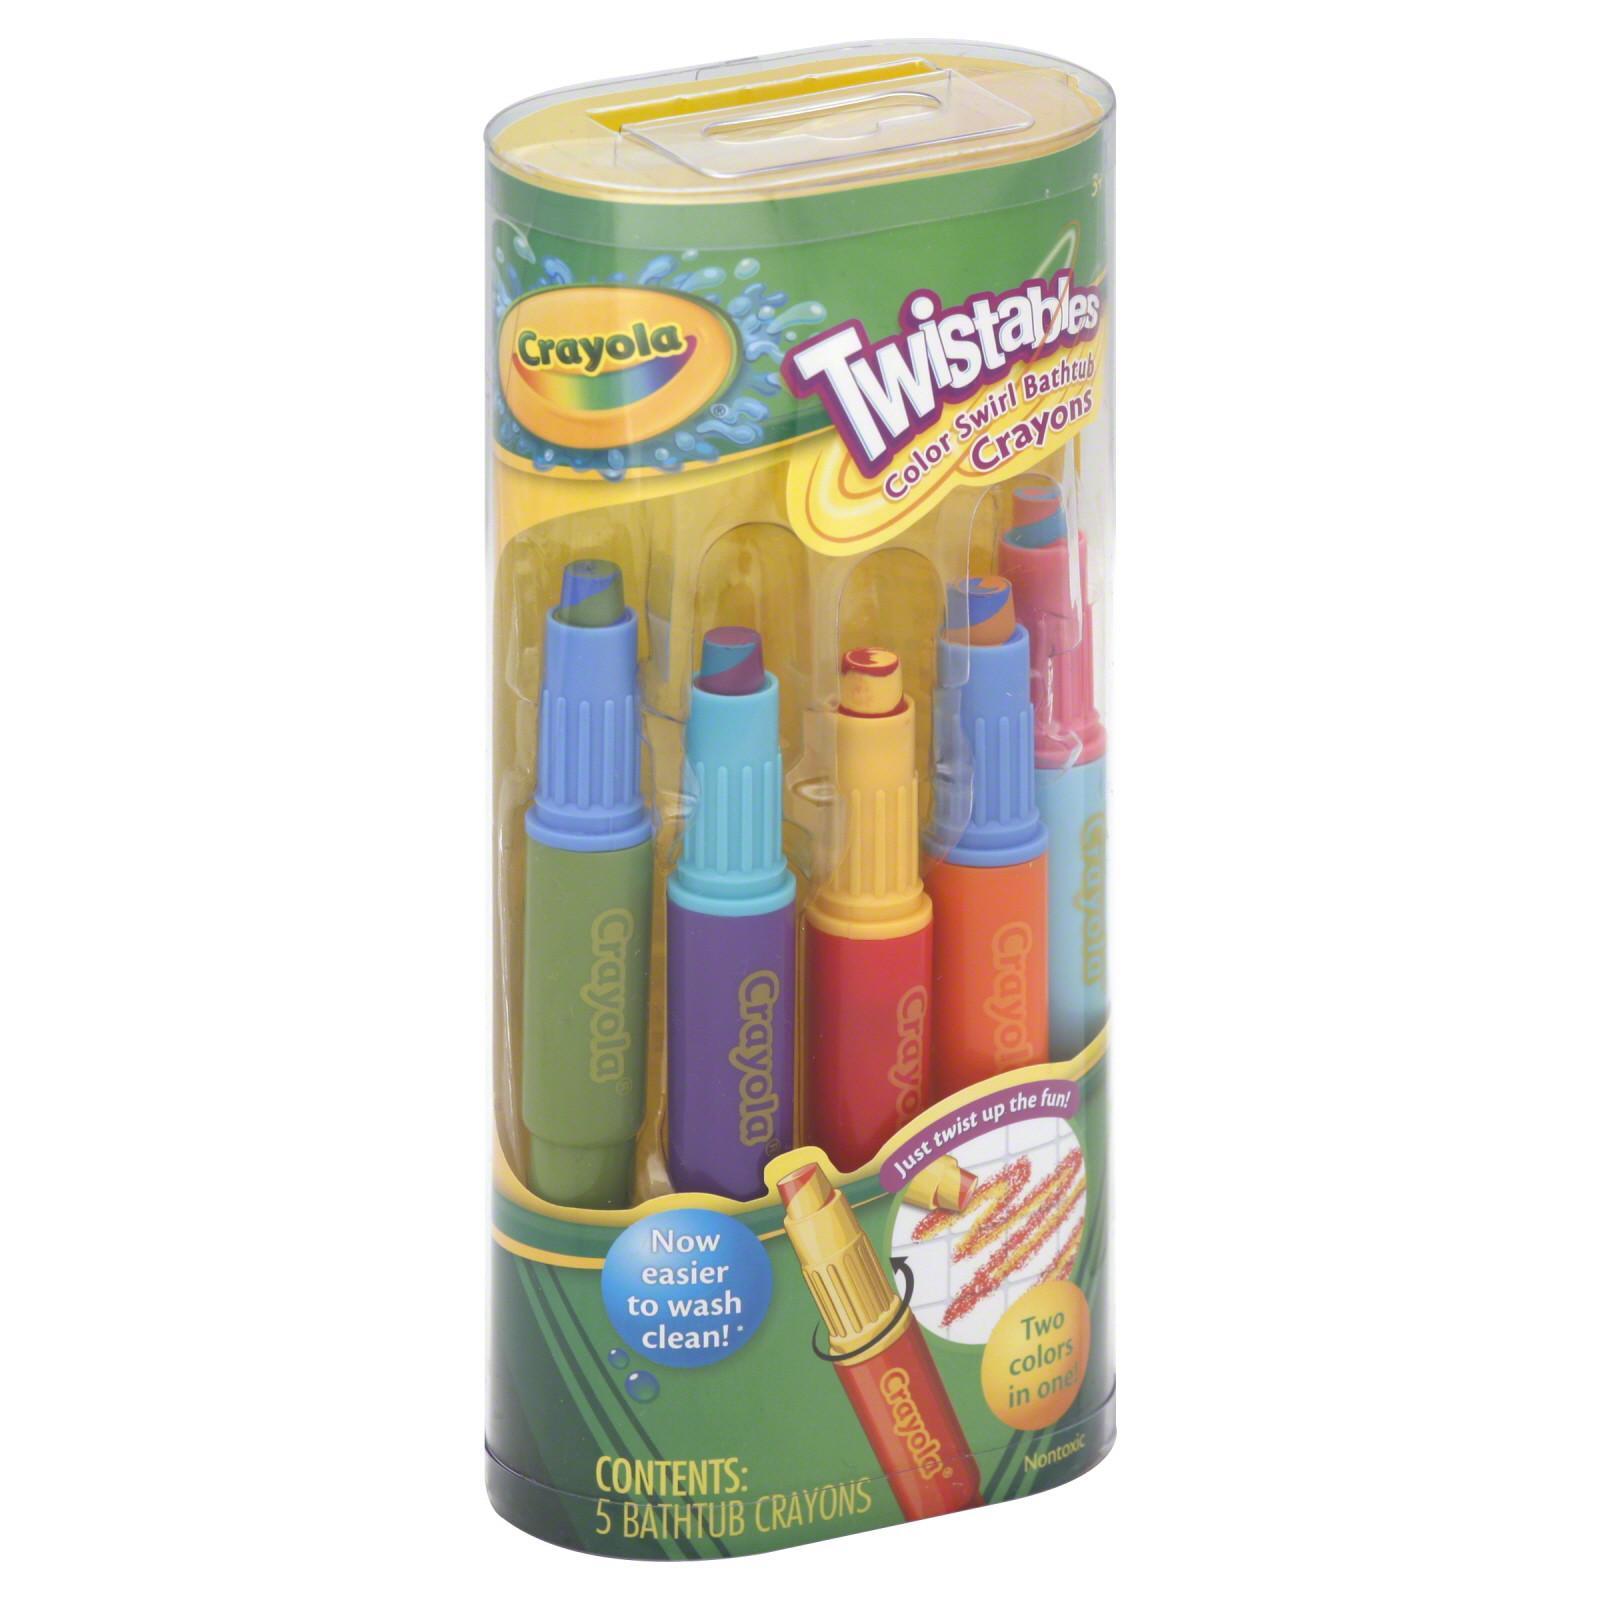 Best ideas about Crayola Bathroom Crayons . Save or Pin Crayola Twistables Color Swirl Bathtub Crayons 5 Piece Now.